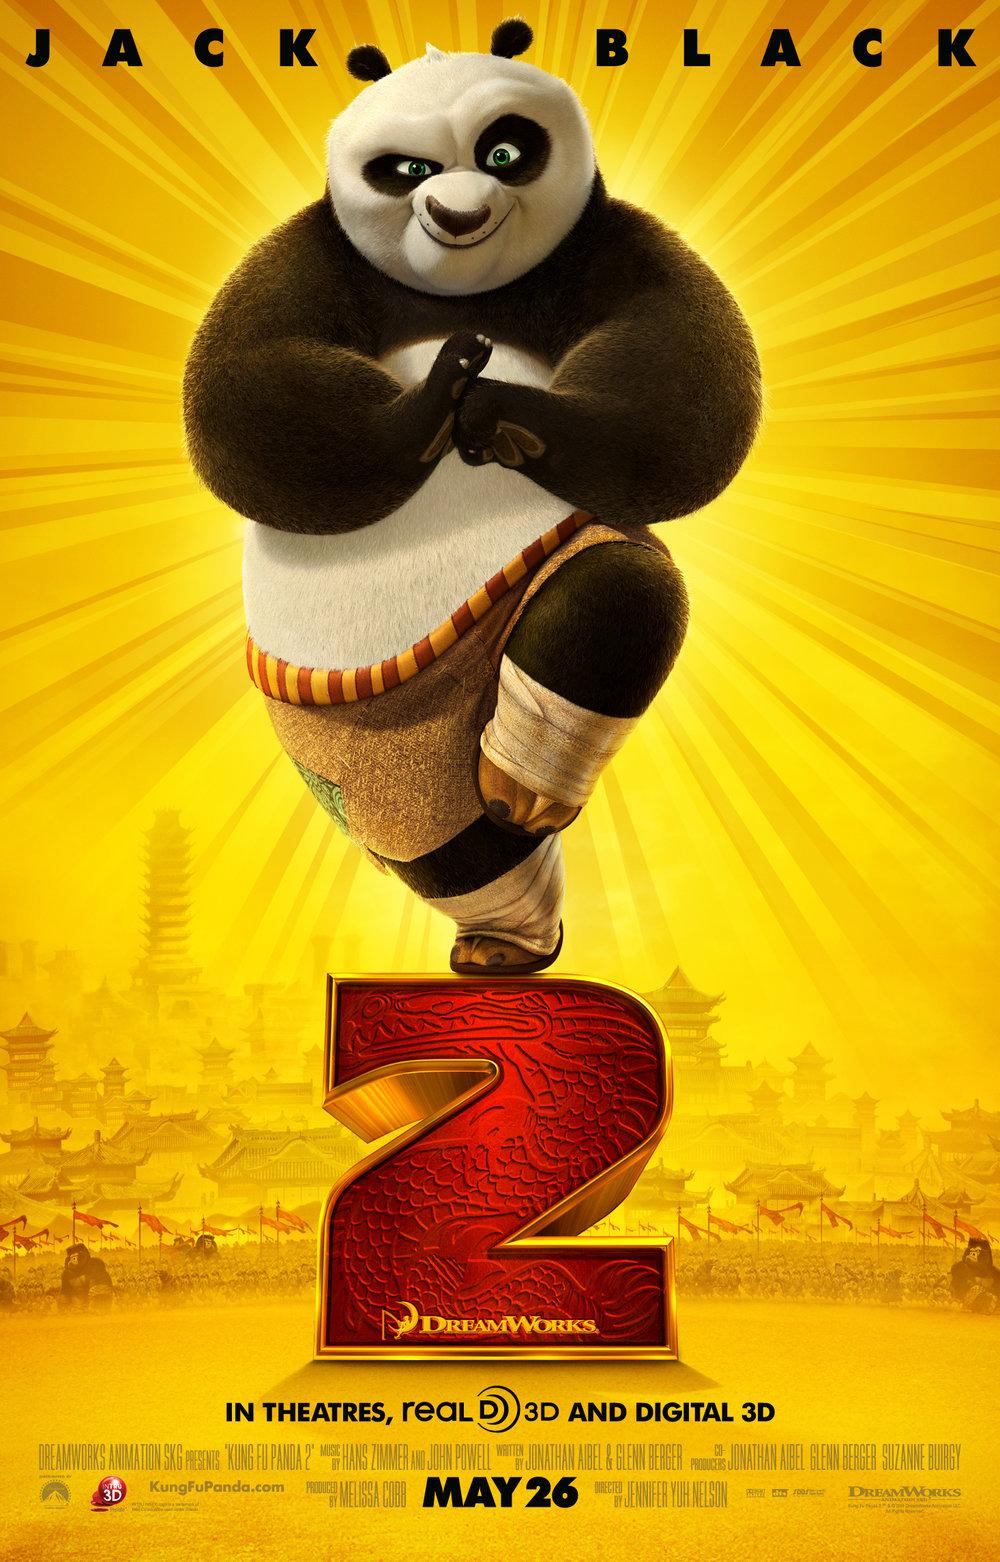 kung-fu-panda-movie-poster-03.jpg